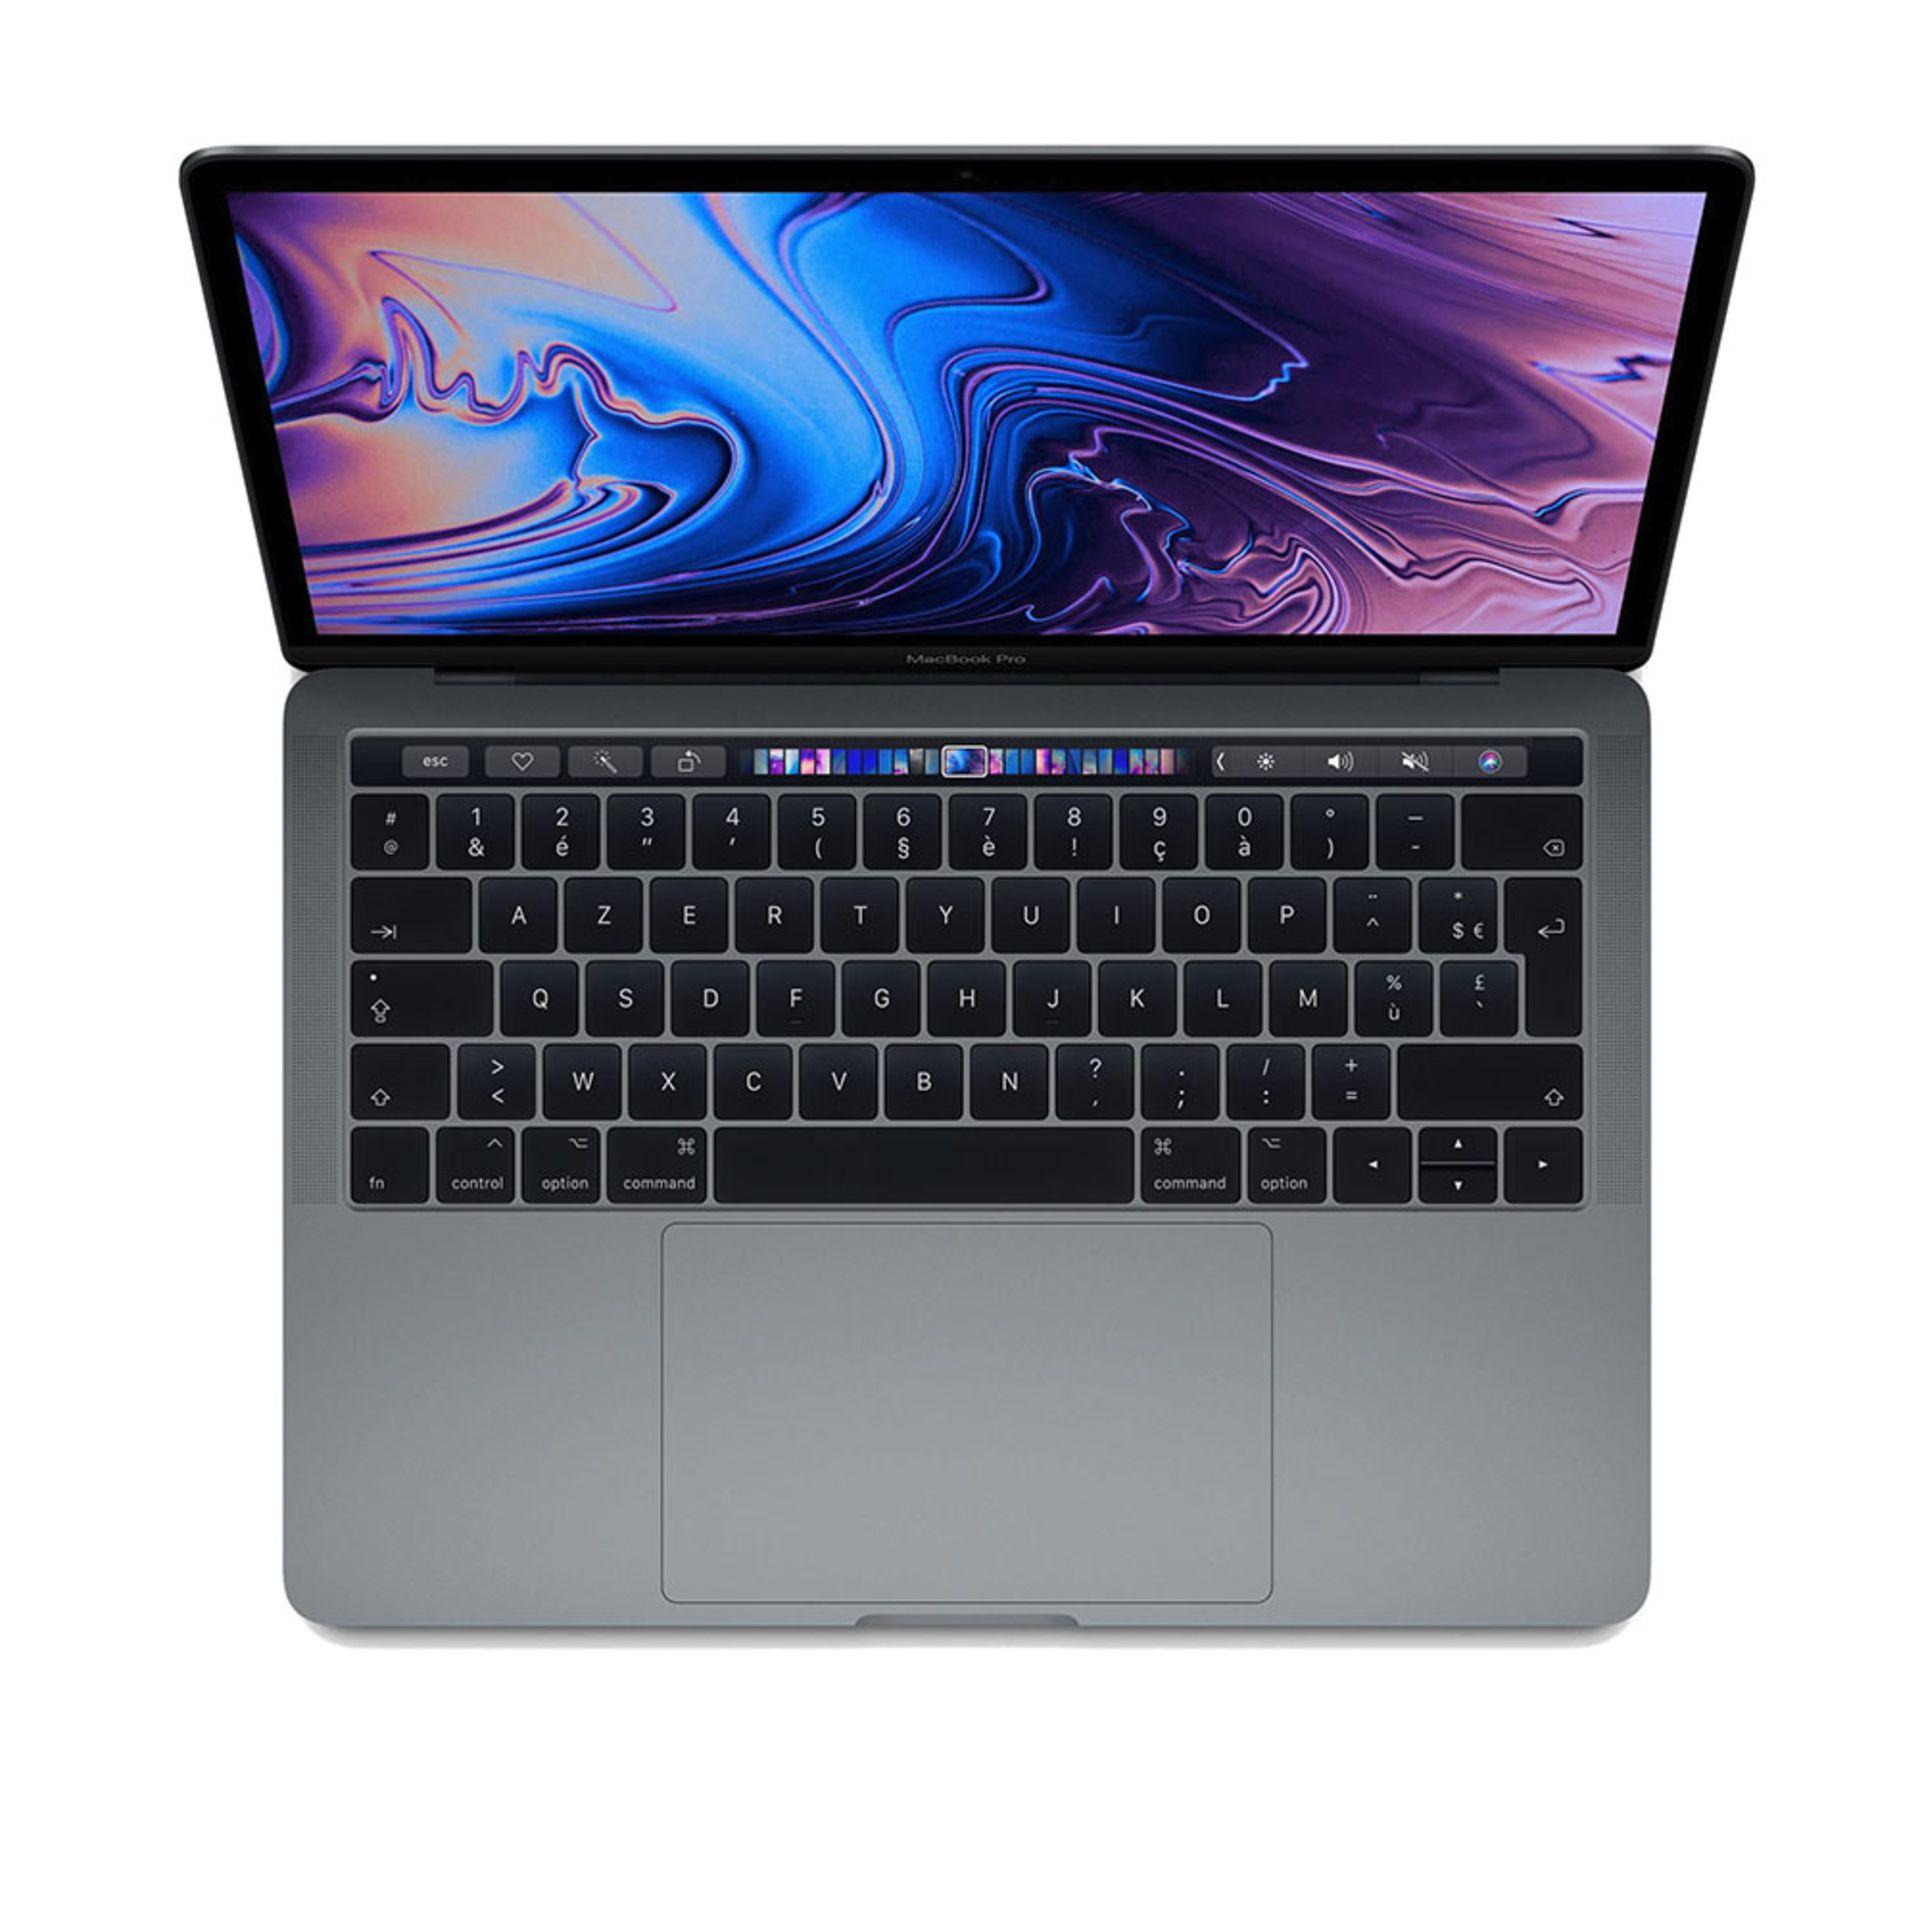 "1 APPLE MACBOOK PRO 13"" 2018 MODEL I5, 8GB RAM, 256GB SSD MODEL A1989 RRP £1299 (NEEDS NEW BATTERY,"